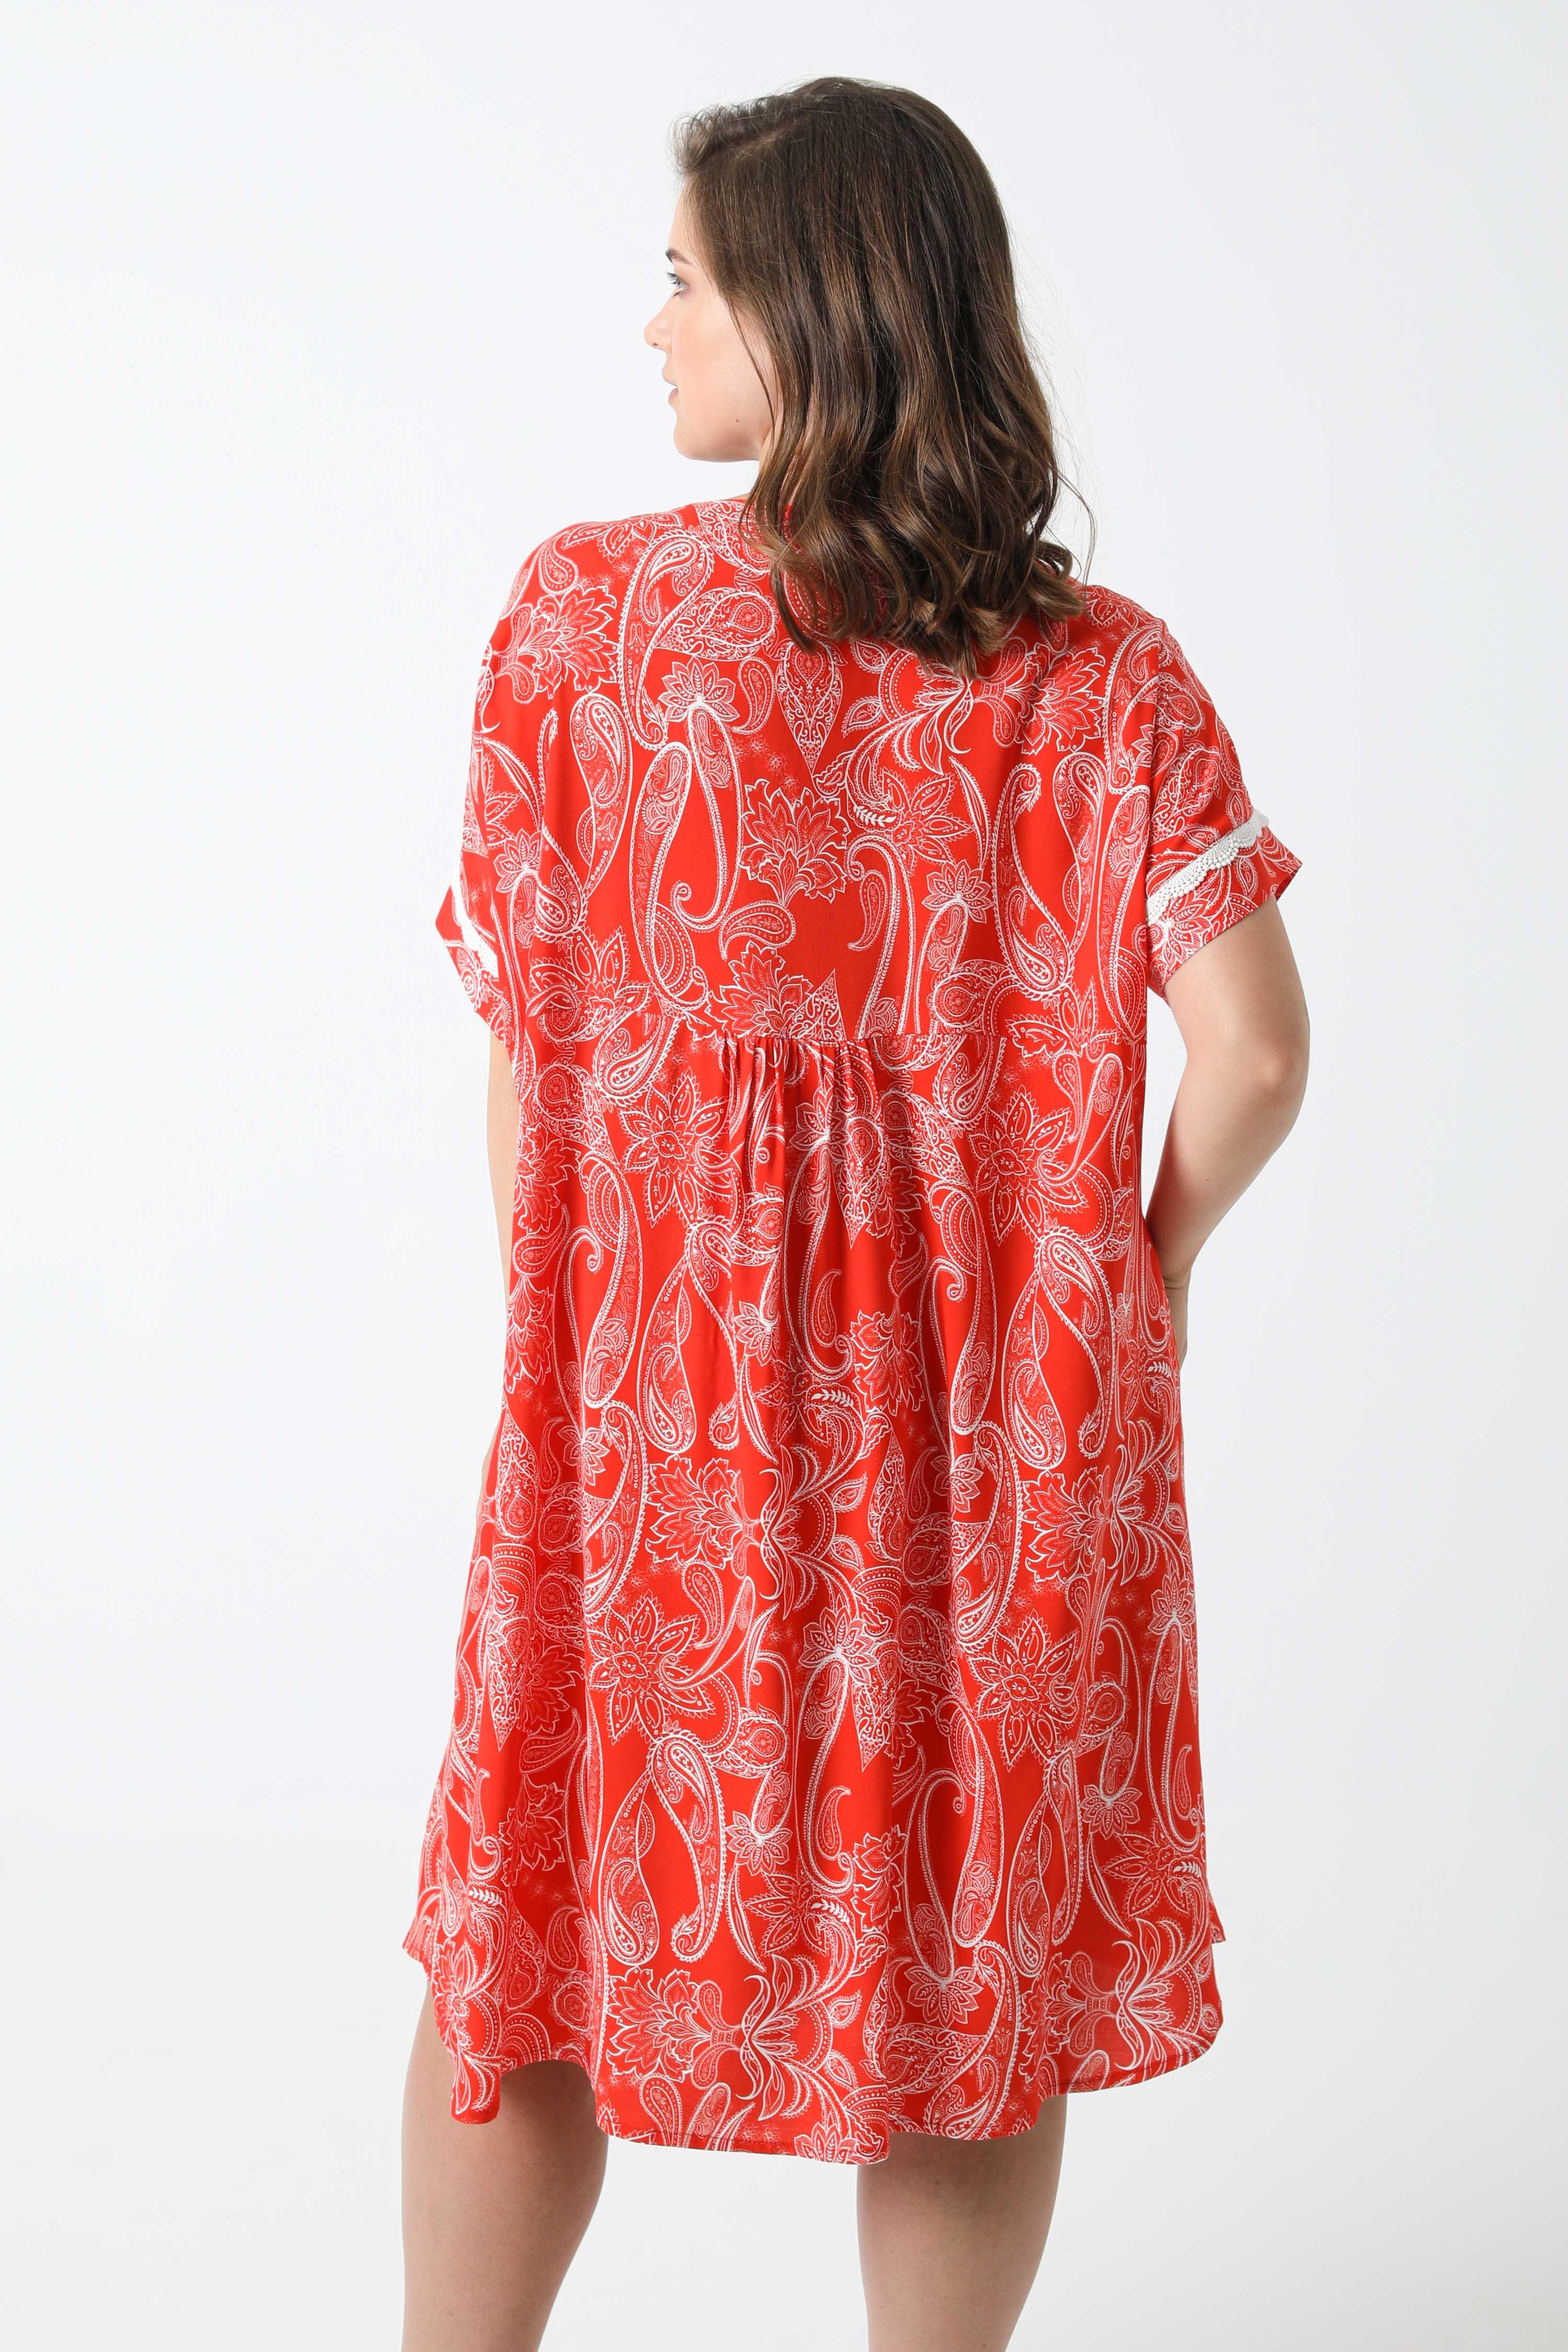 Mid-length dress printed with oeko-tex fabrics (Shipping 10: 15 June)